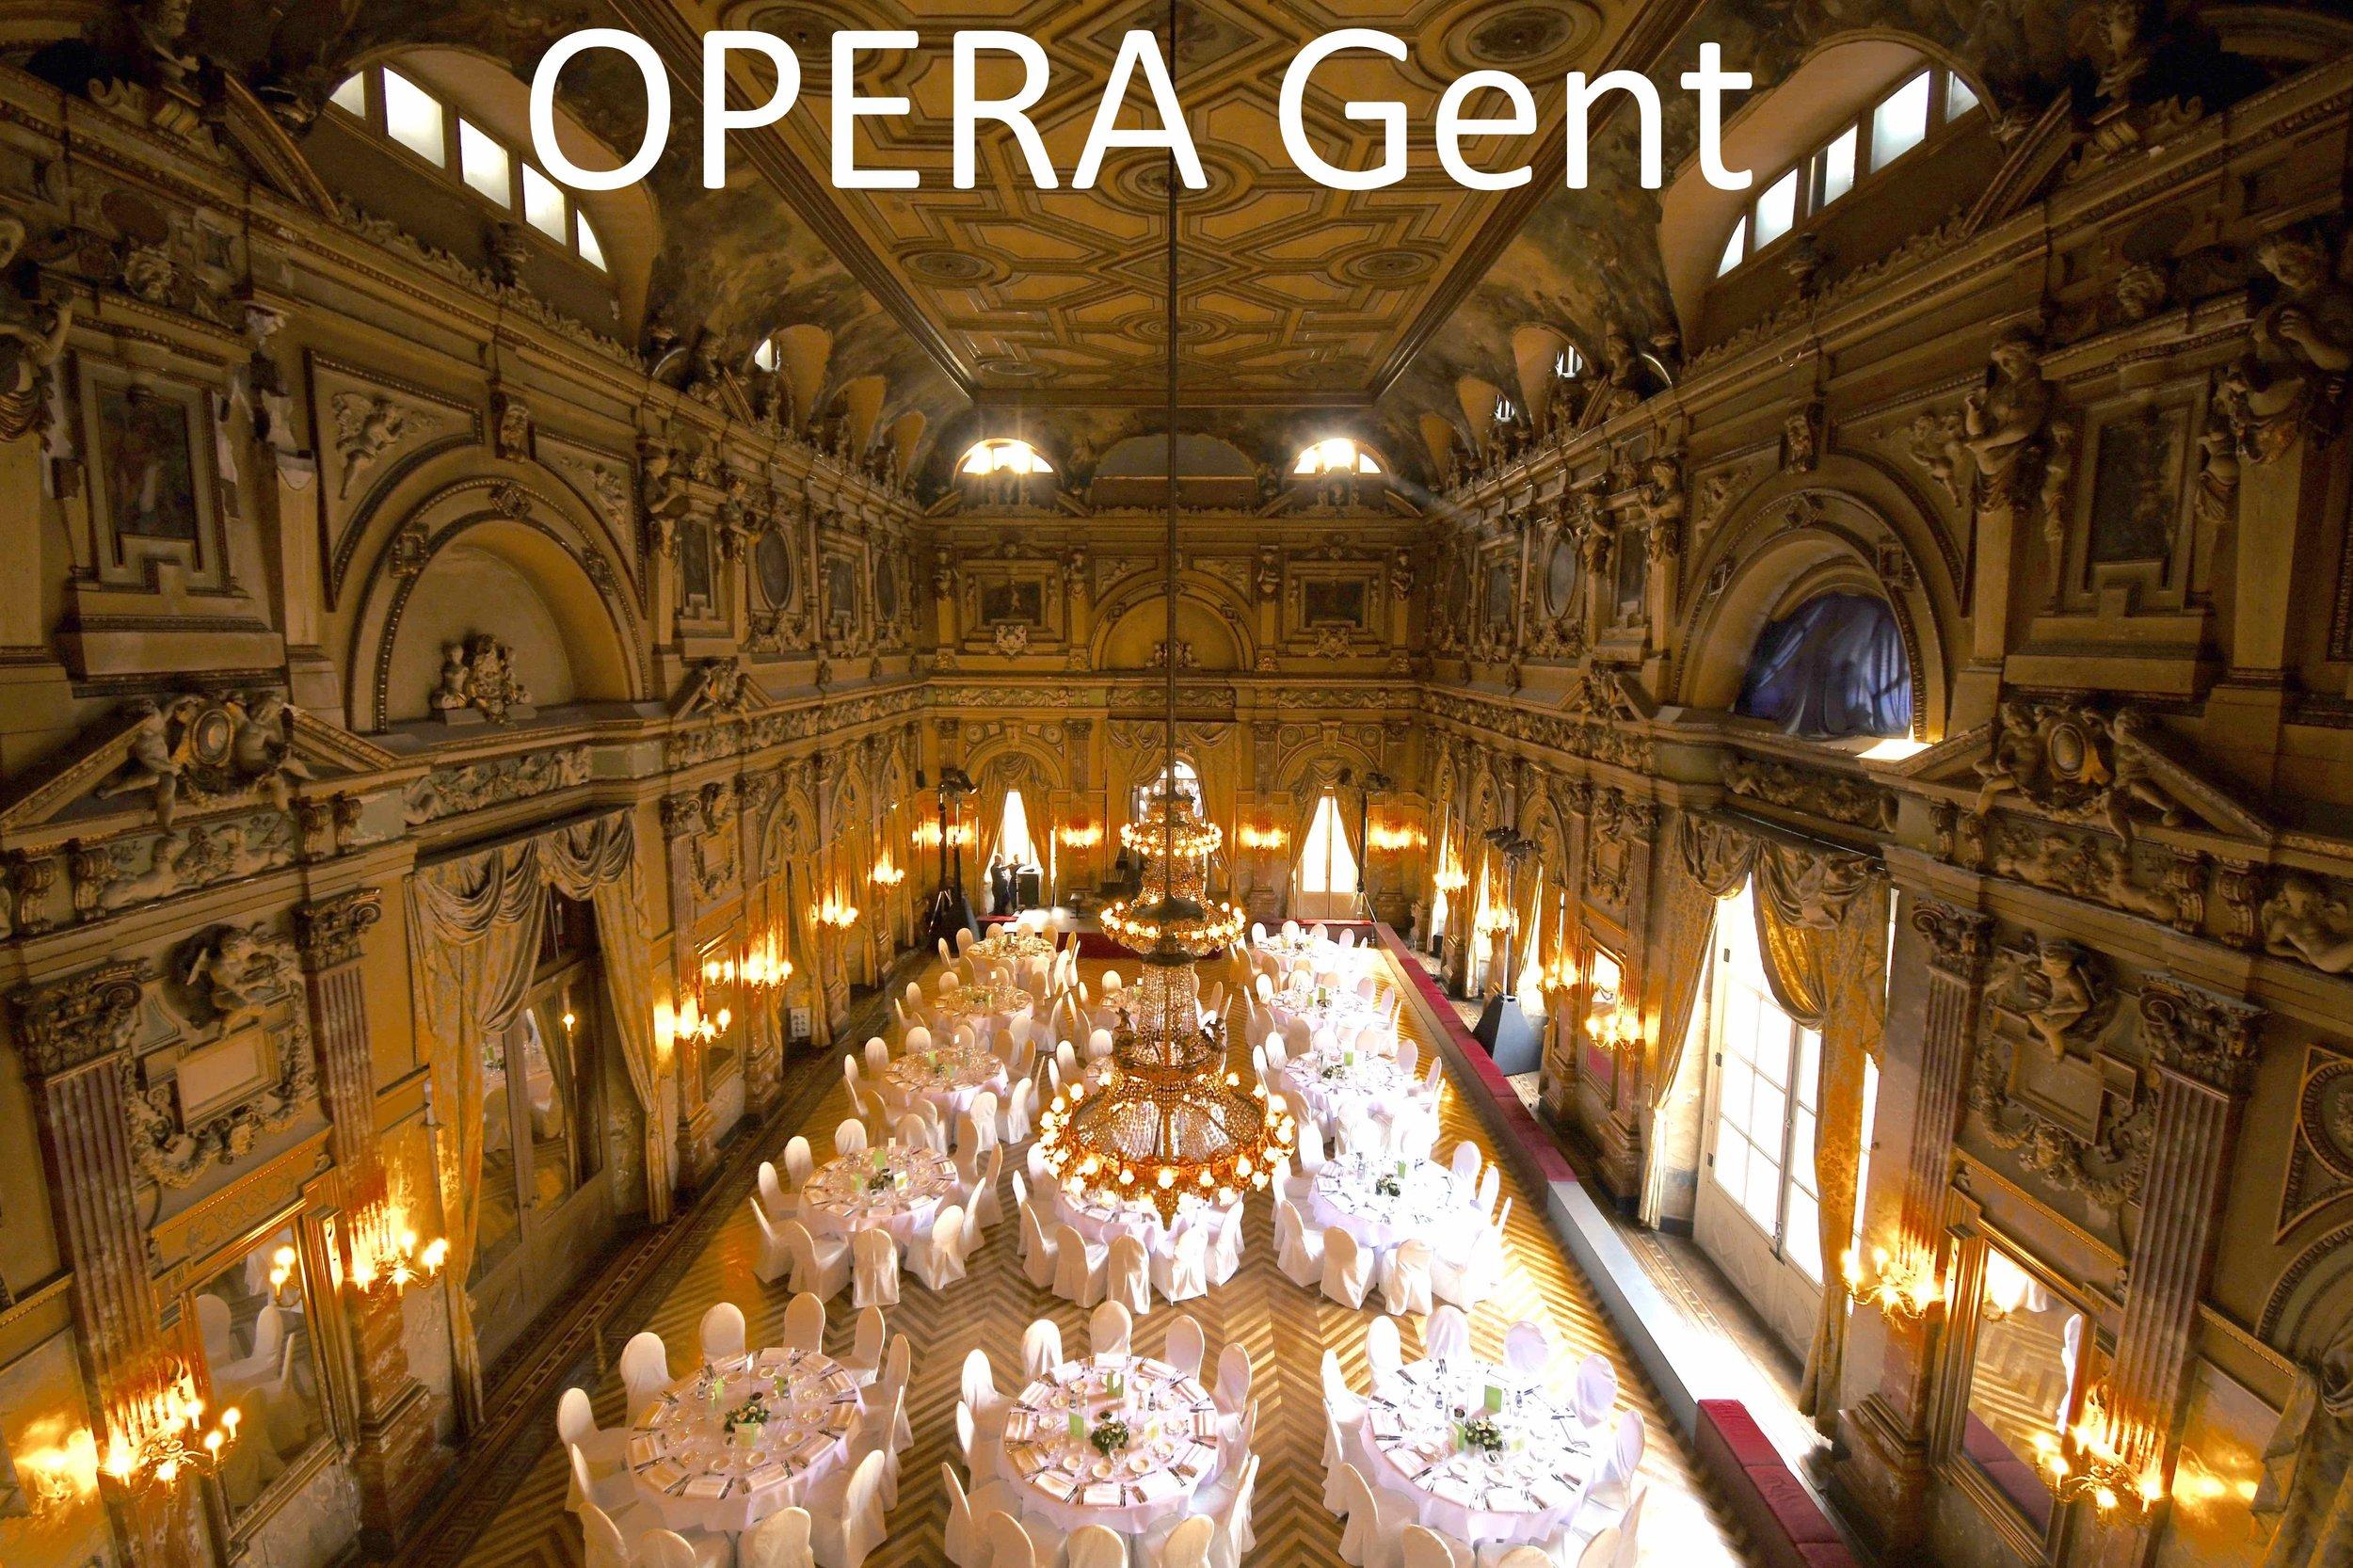 Copy of OPERA GENT by FOODstories